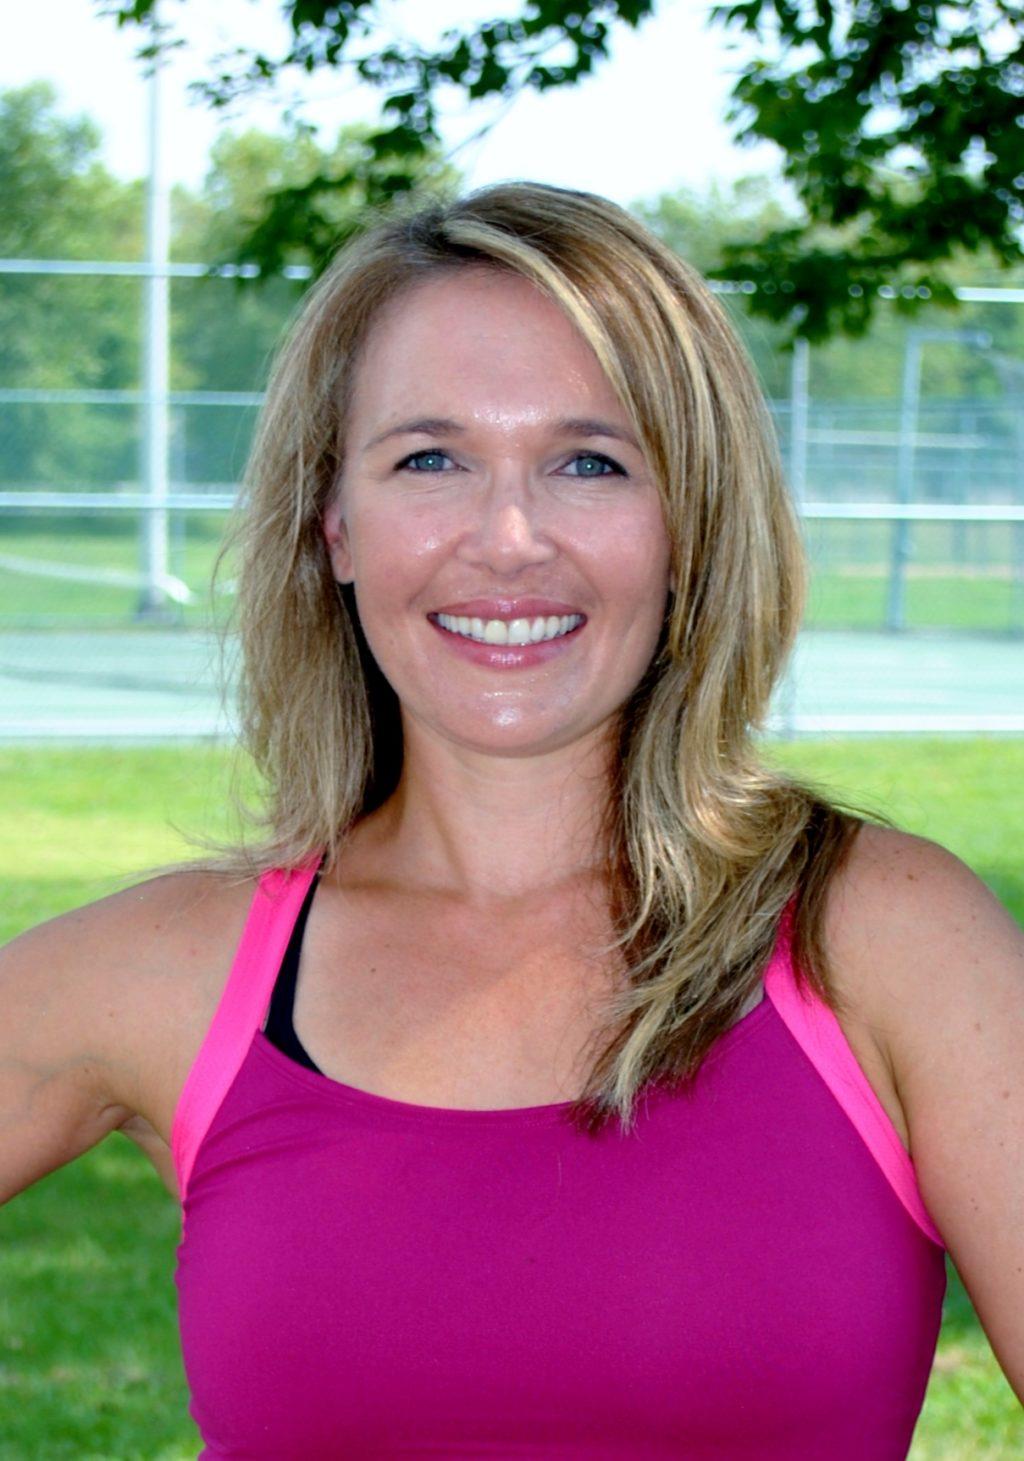 Personal Trainer Eureka, Missouri - Melissa Moran